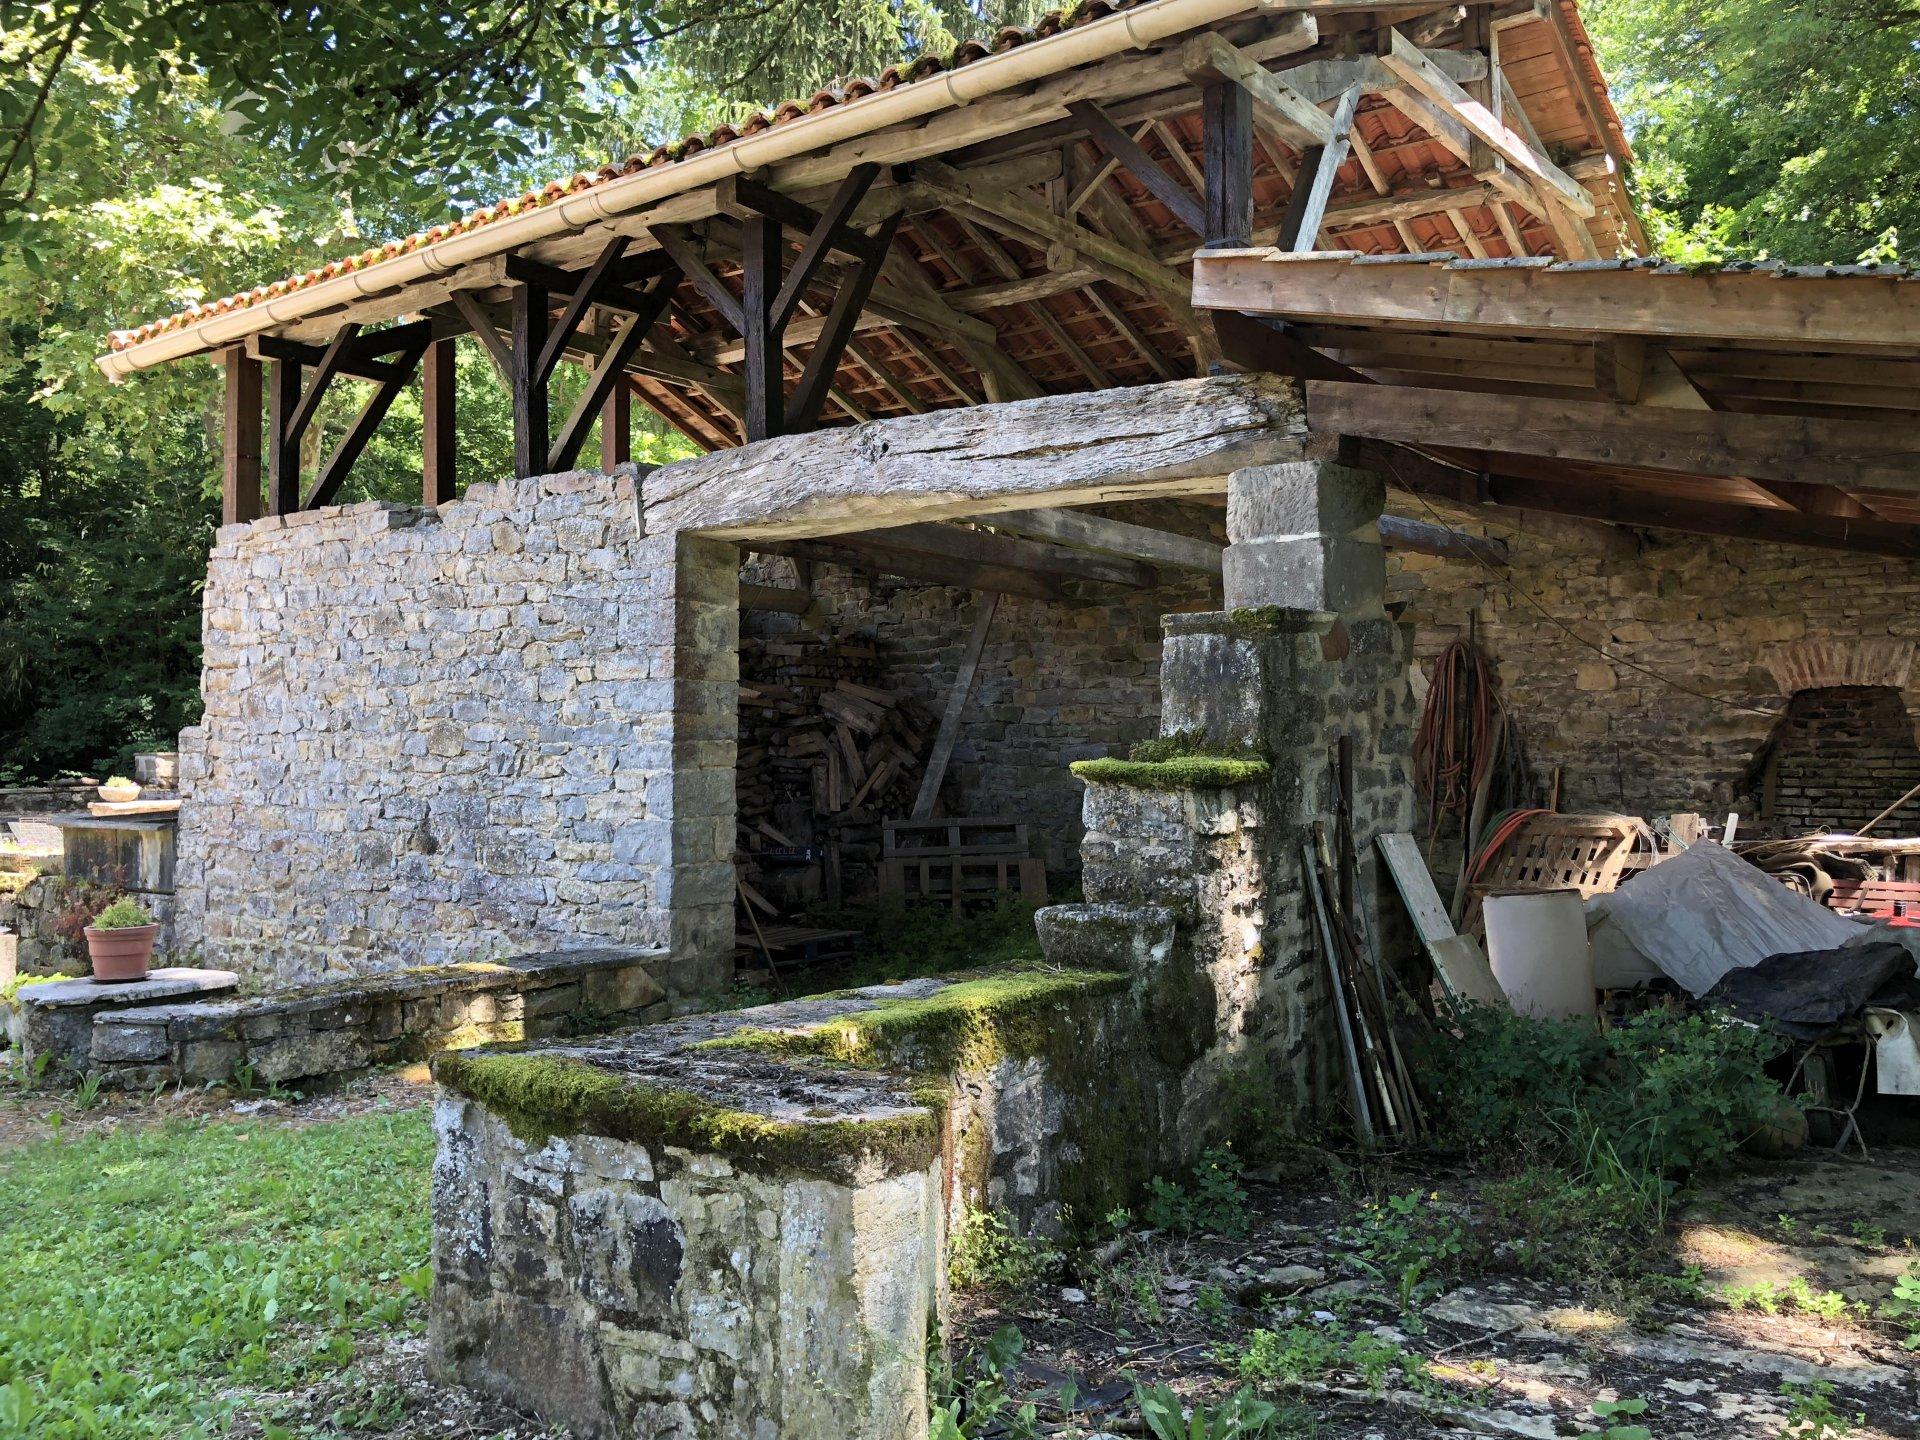 Moulin du 13e siècle